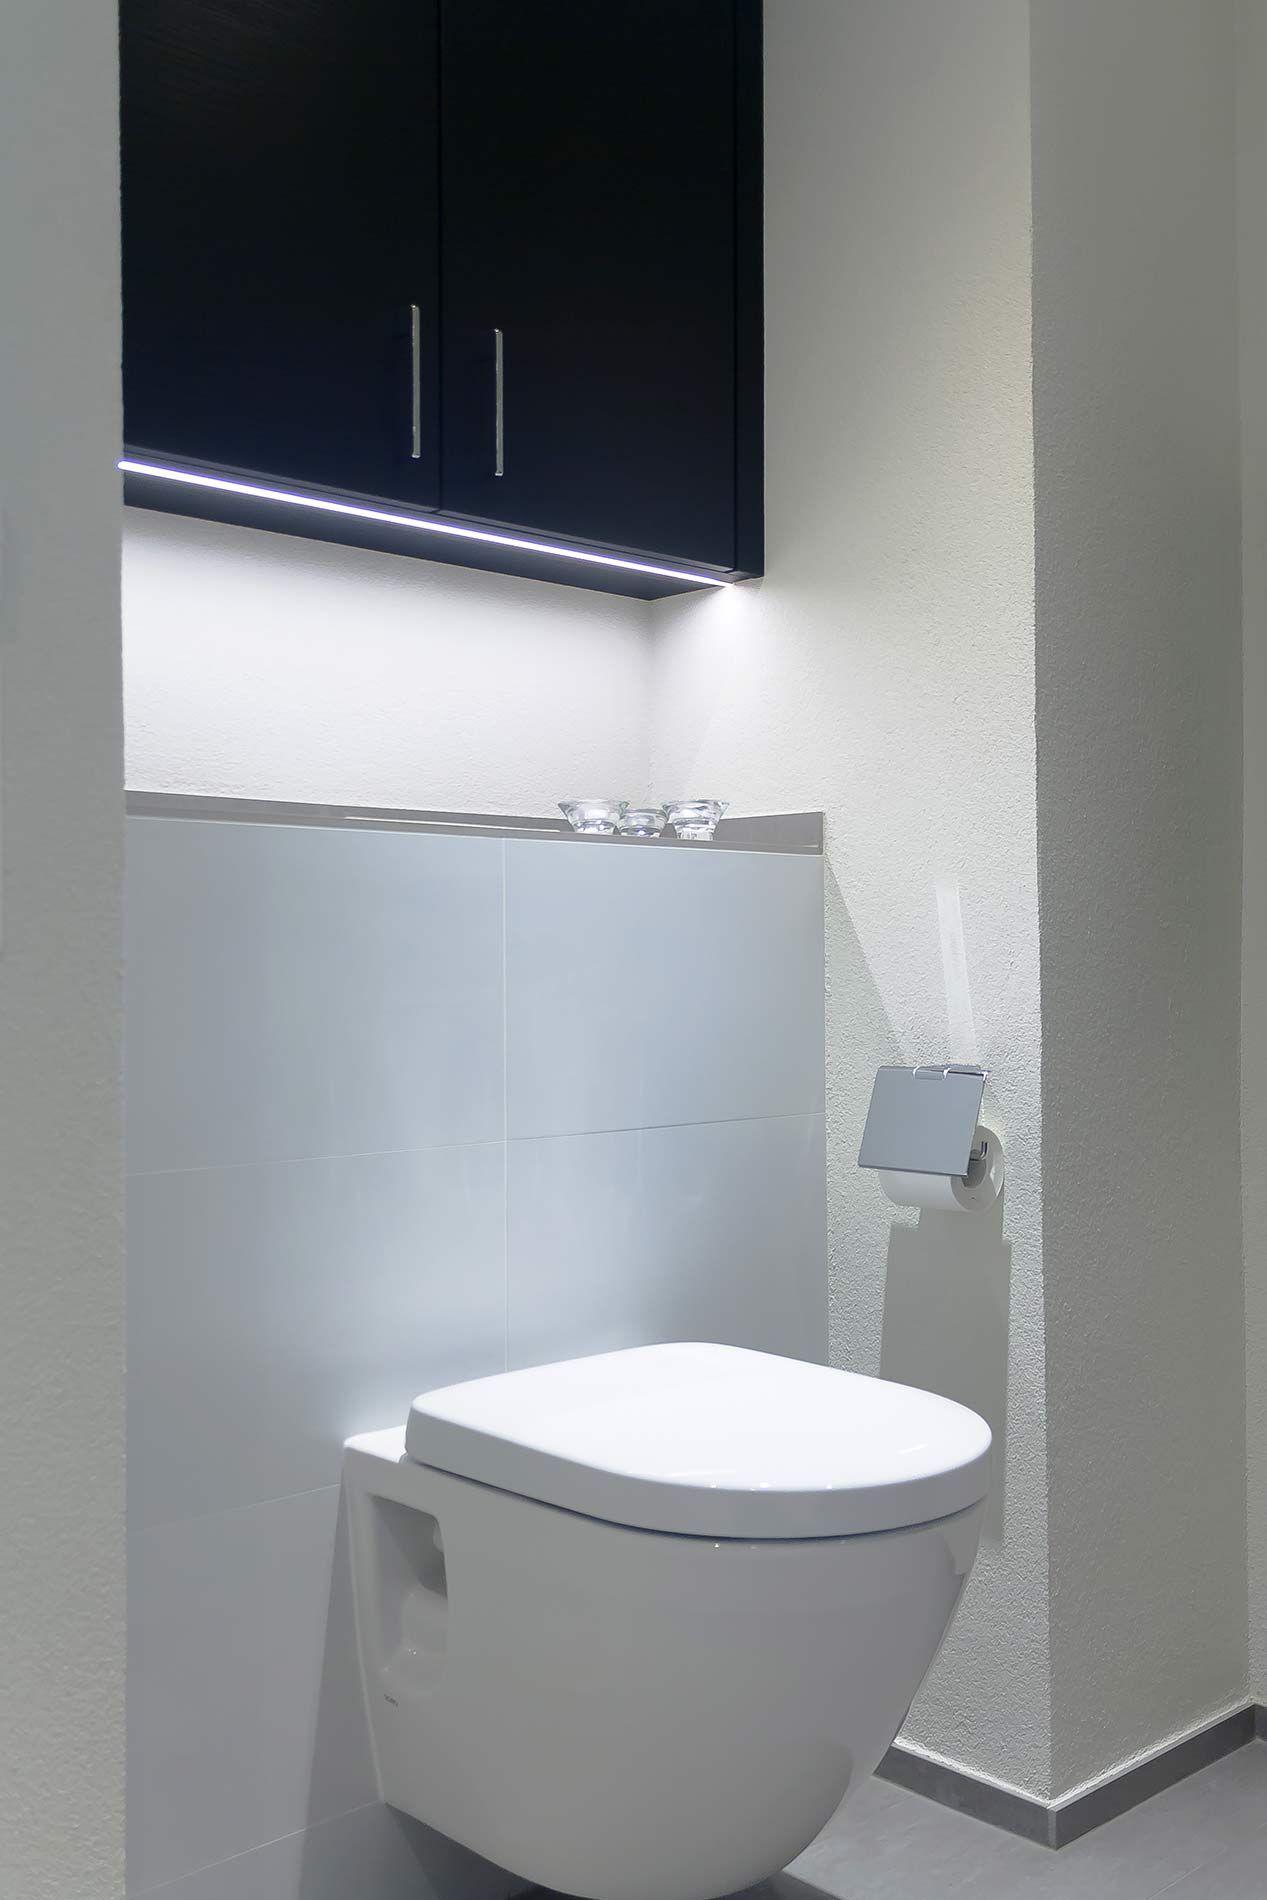 Badezimmer Badezimmer Badezimmer Schrank Hangeschrank